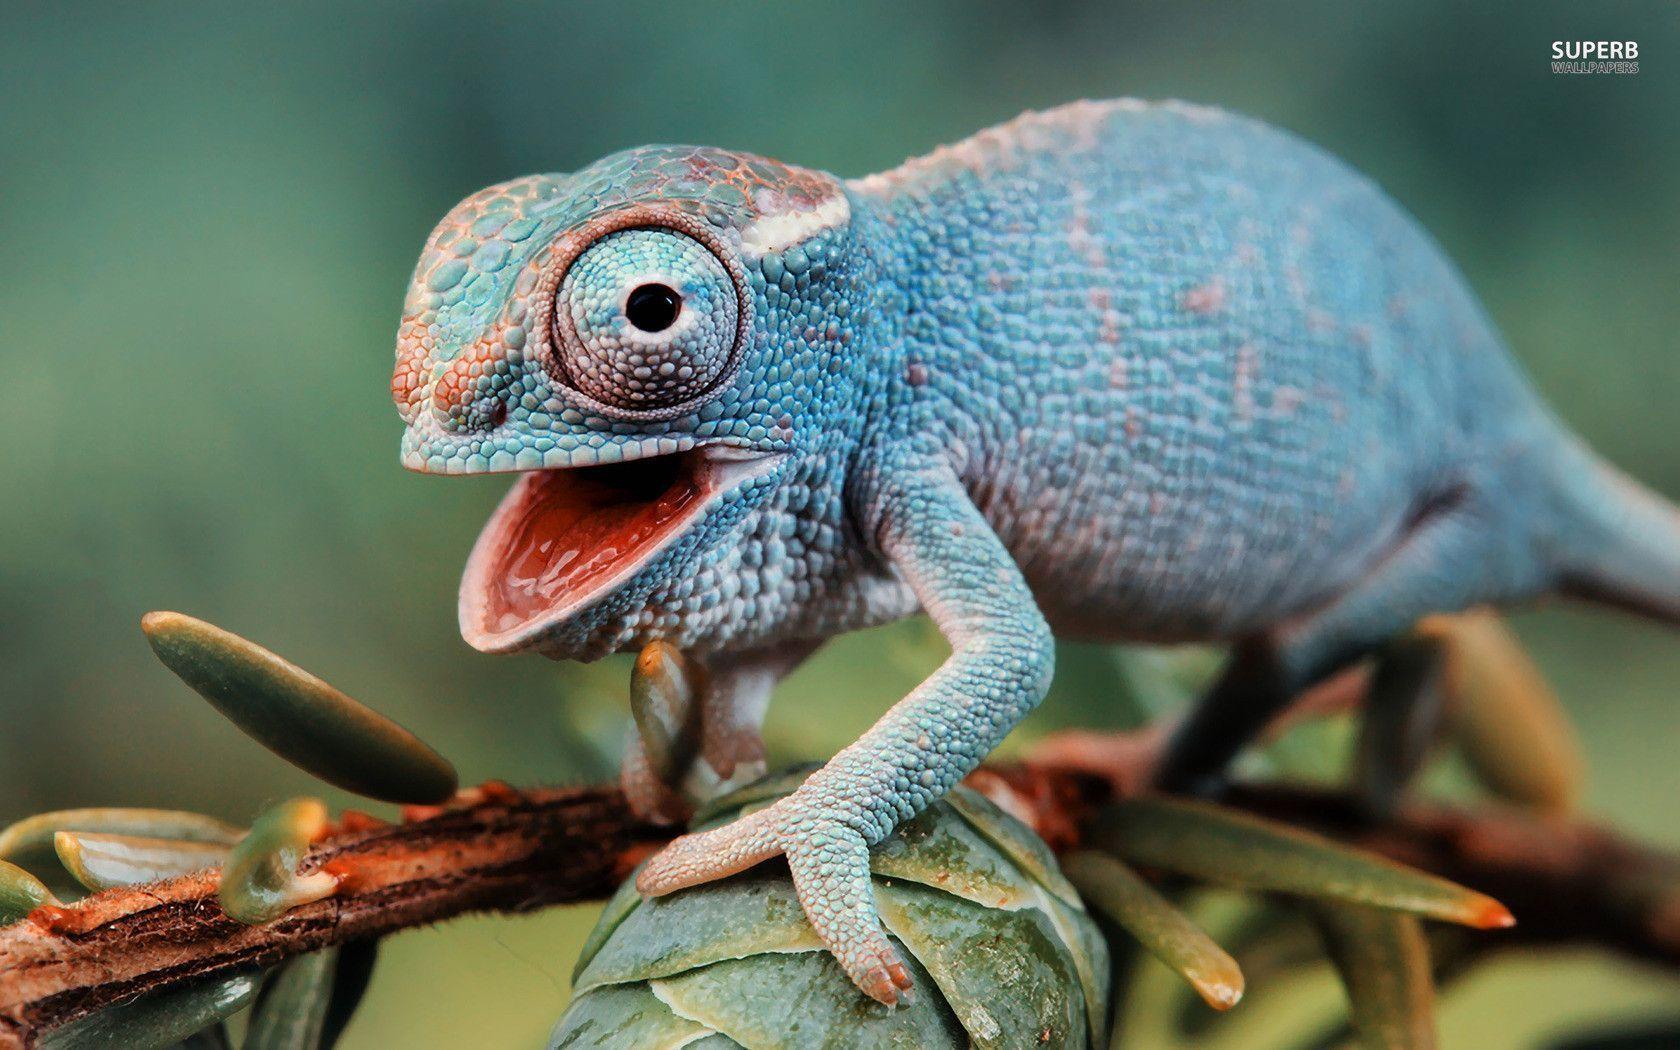 chameleon wallpaper 9661 - photo #13